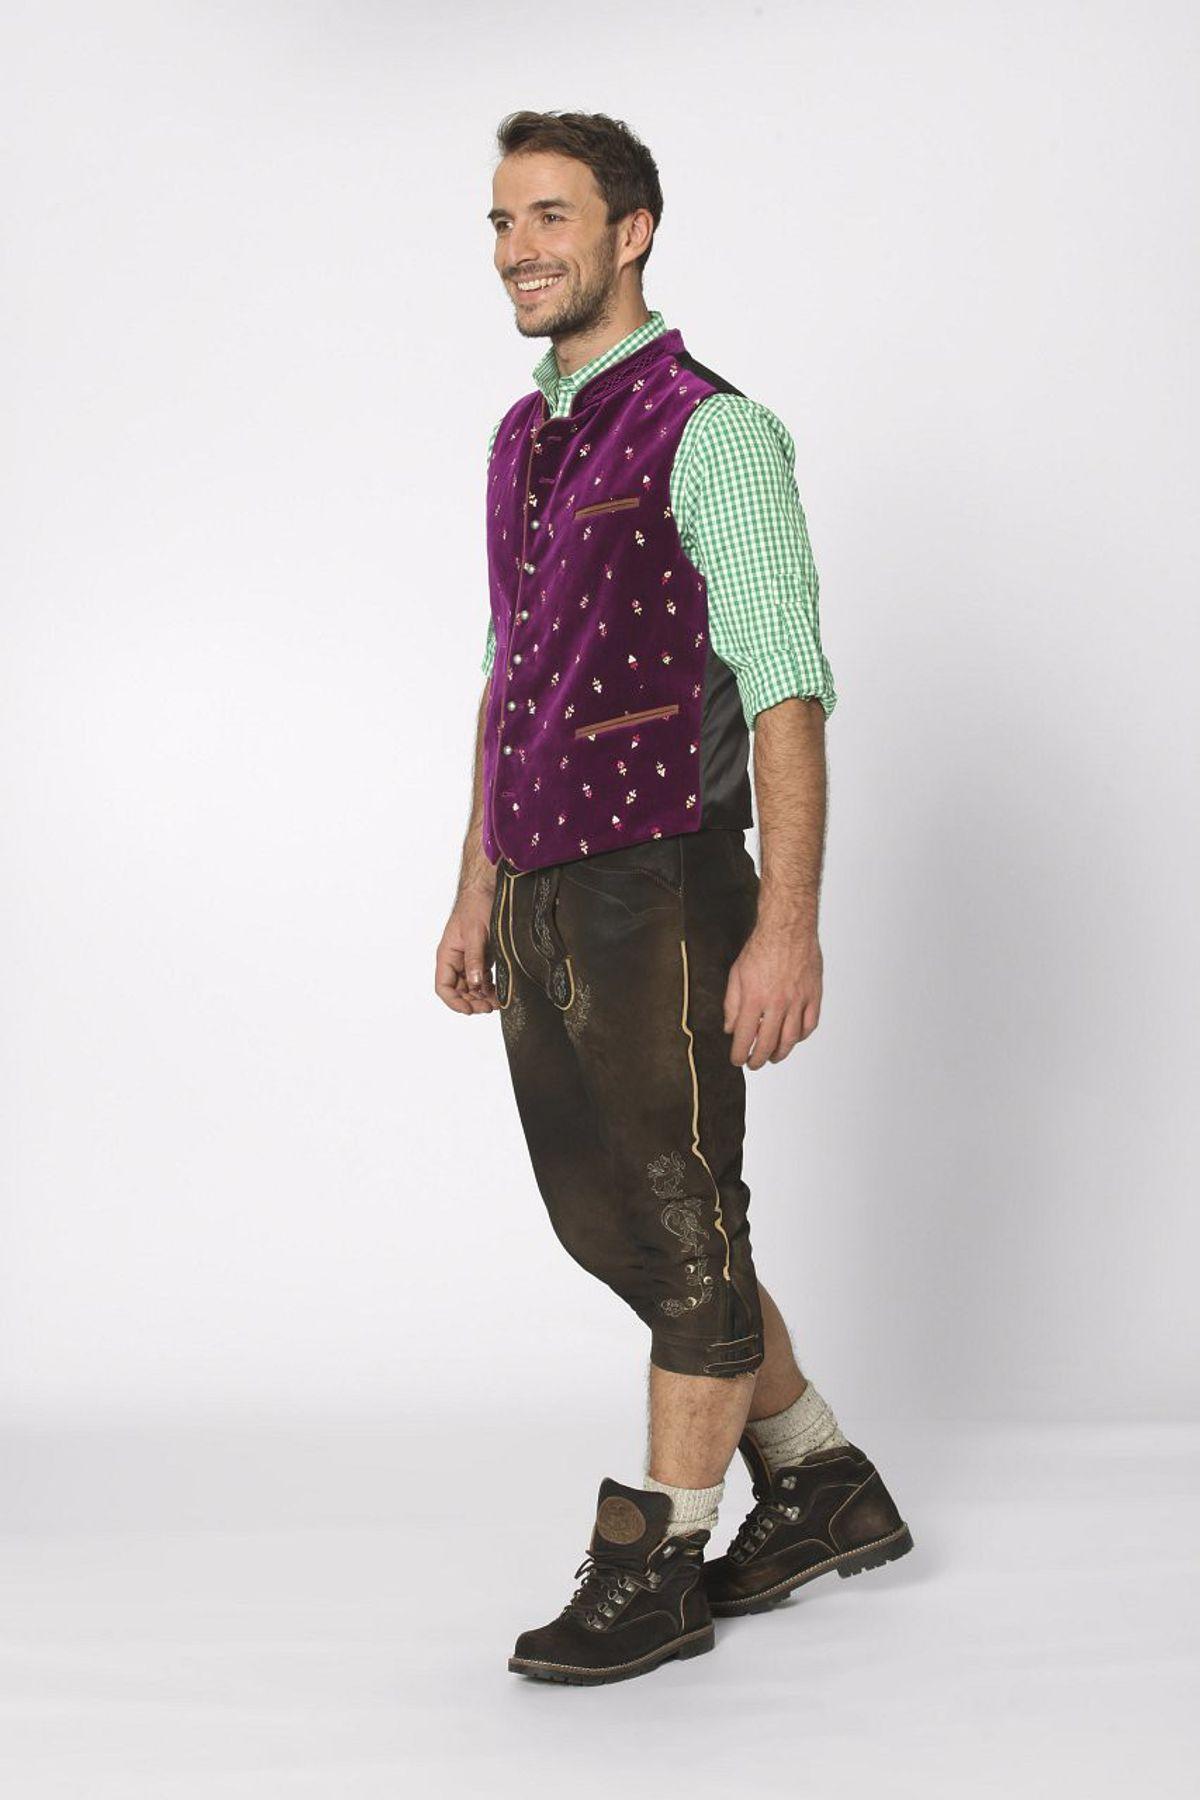 Stockerpoint - Herren Trachten Weste in verschiedenen Farbtönen, Calzado – Bild 22